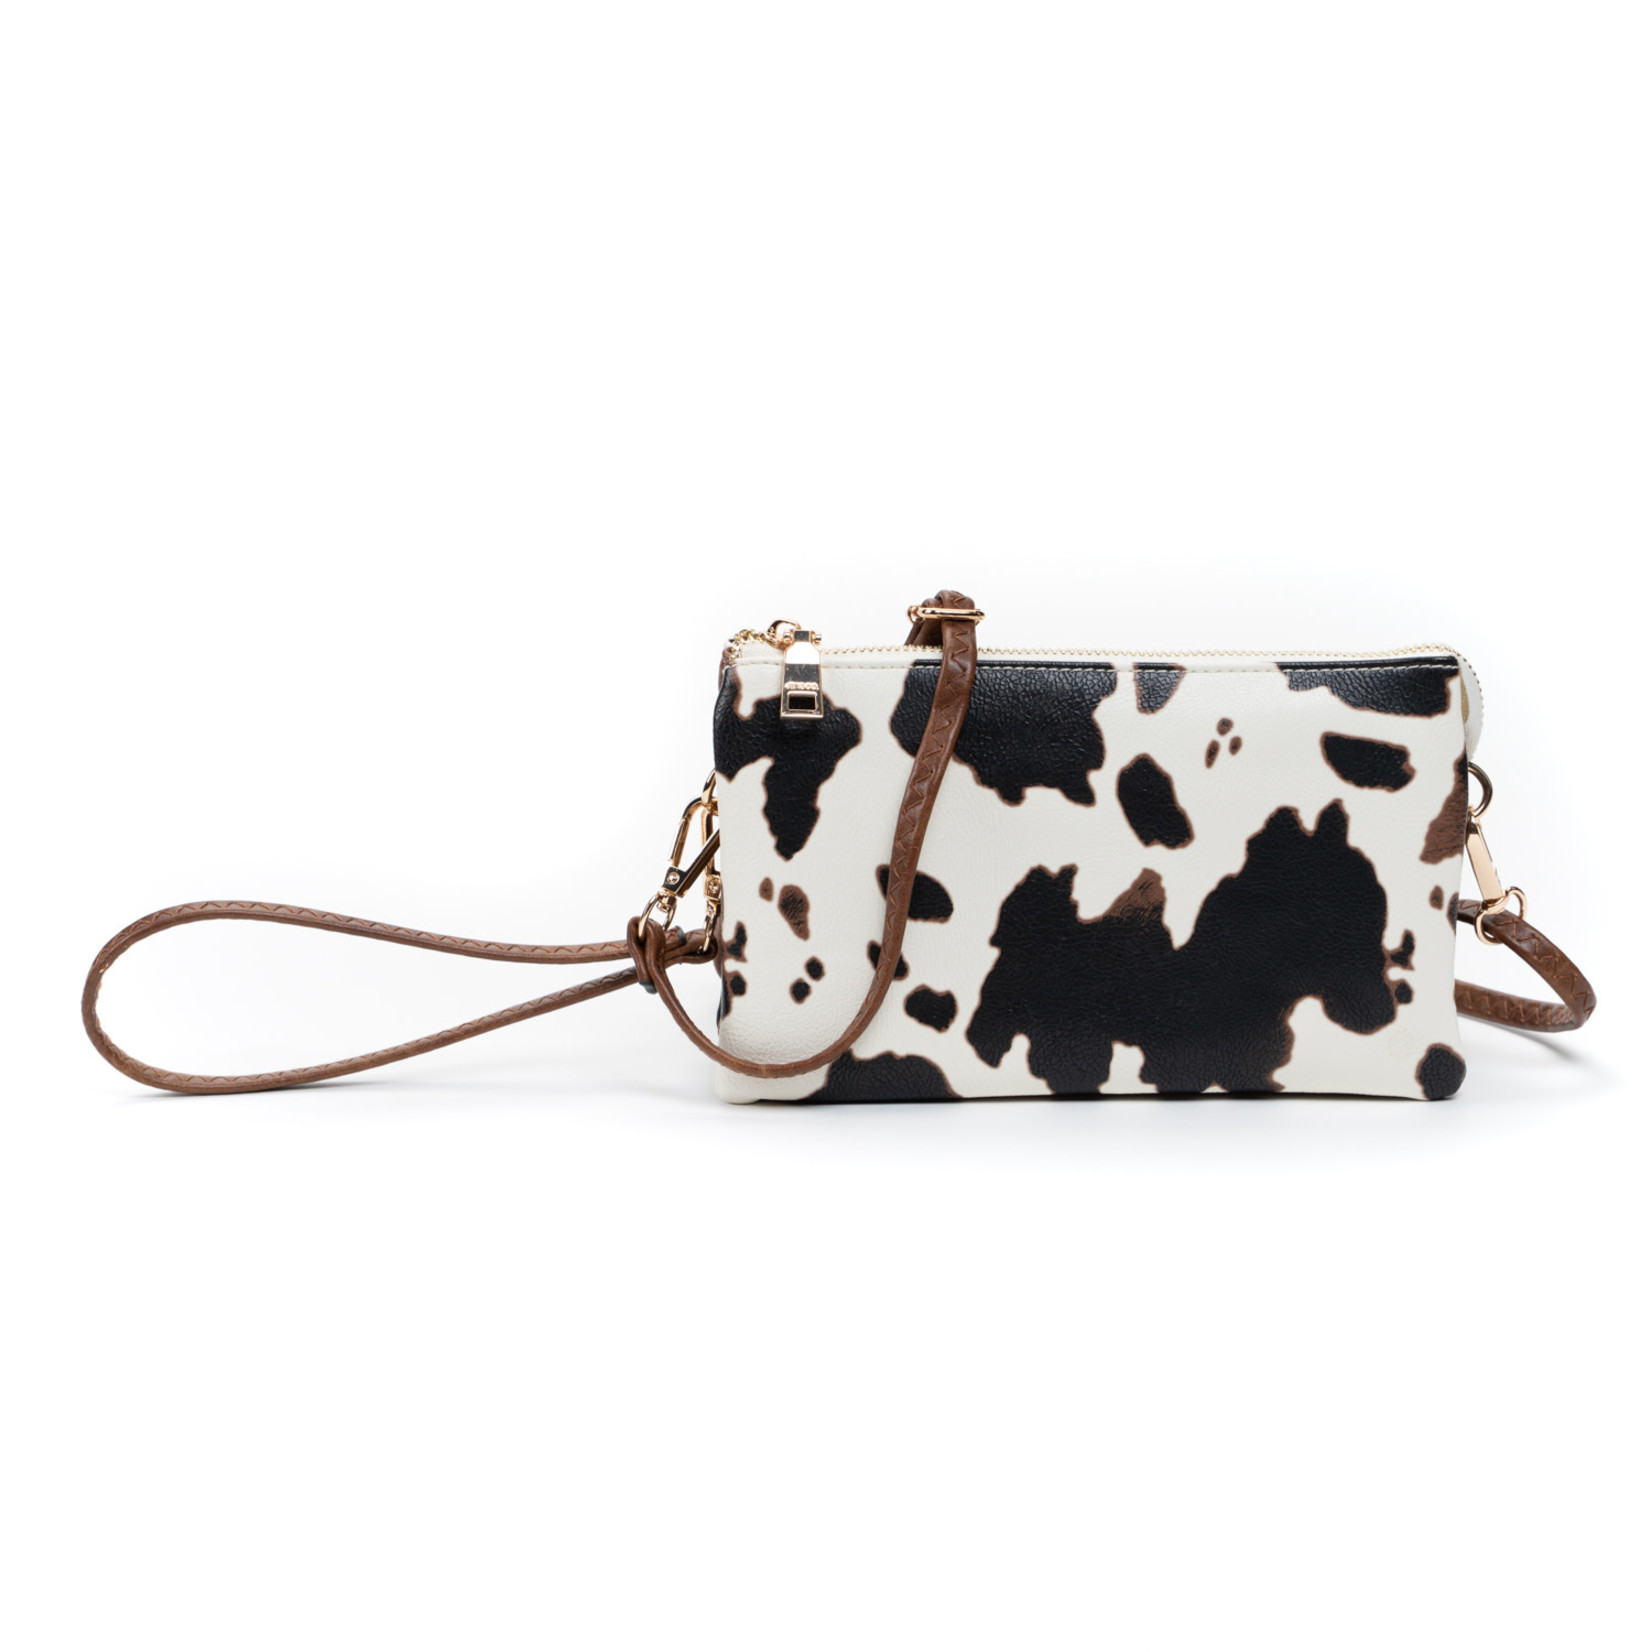 Riley Vegan Lthr Dbl Sided Wristlet/Crossbody - Cow White